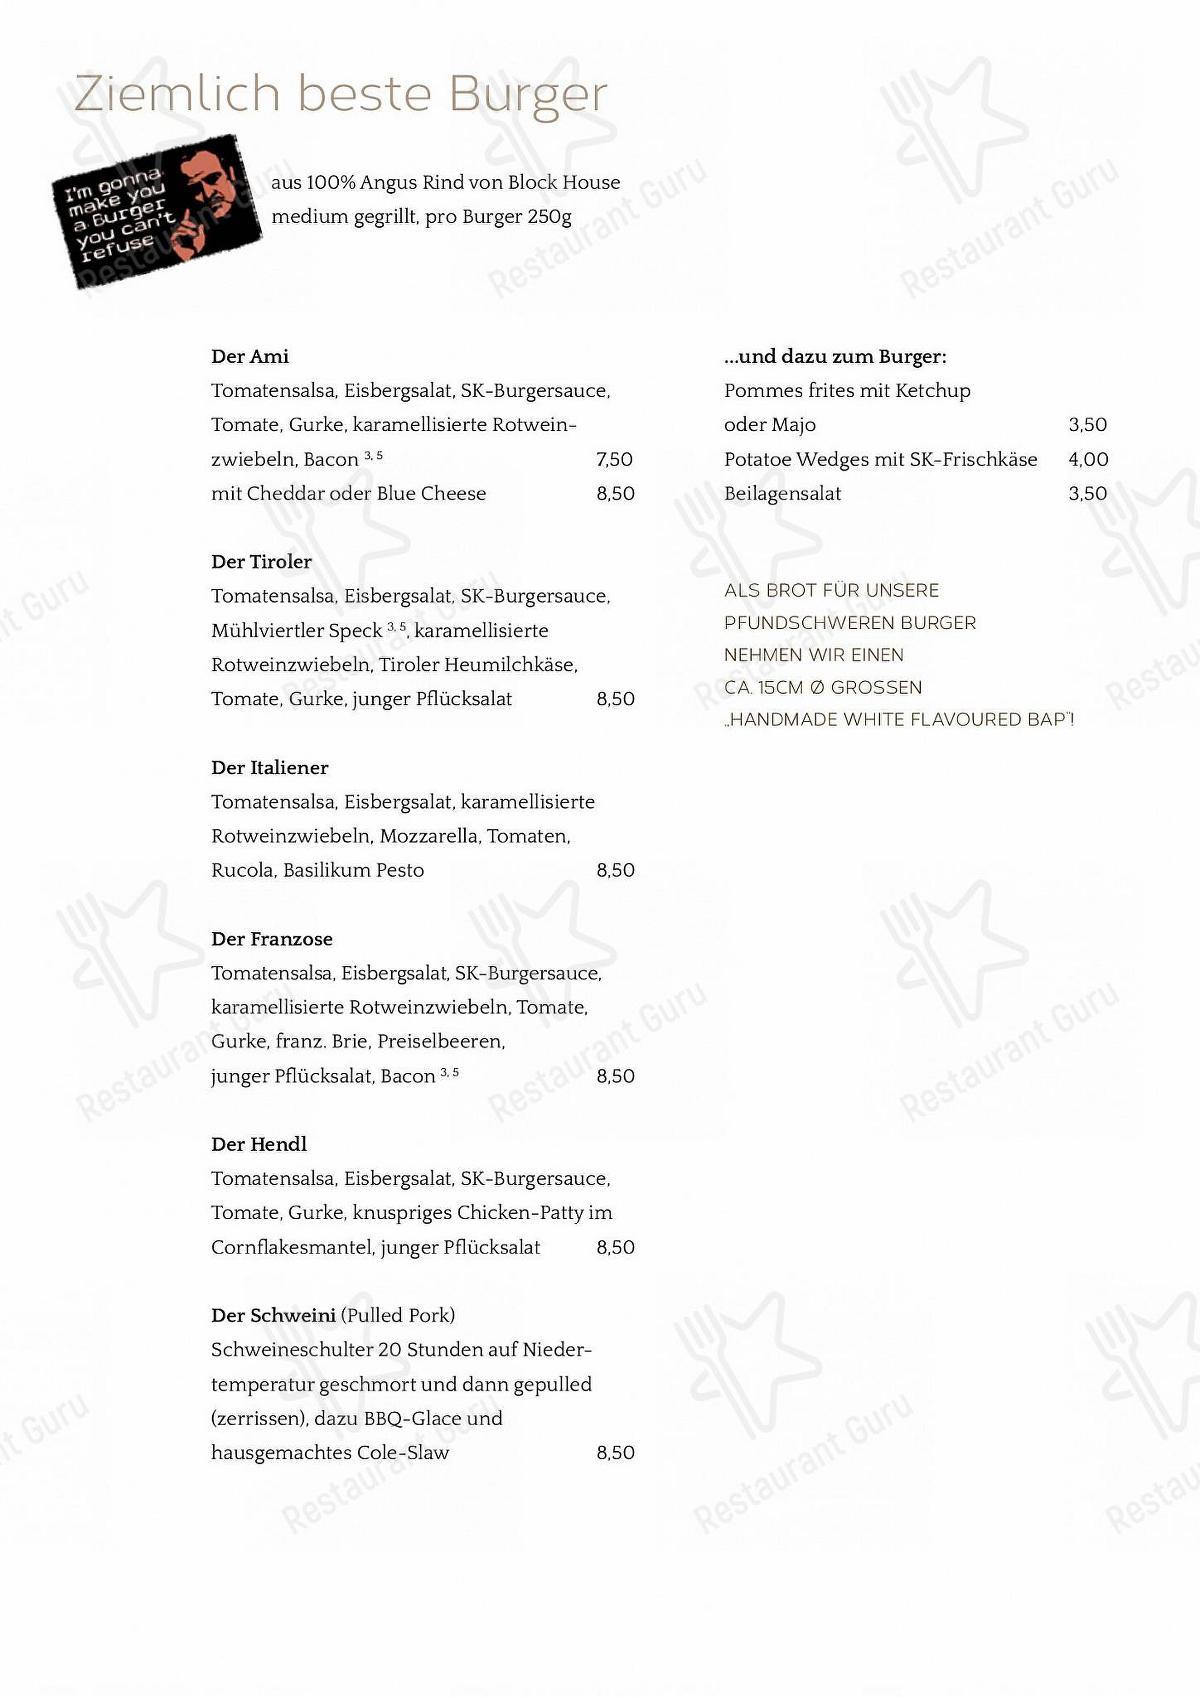 Stechl Keller menu - meals and drinks